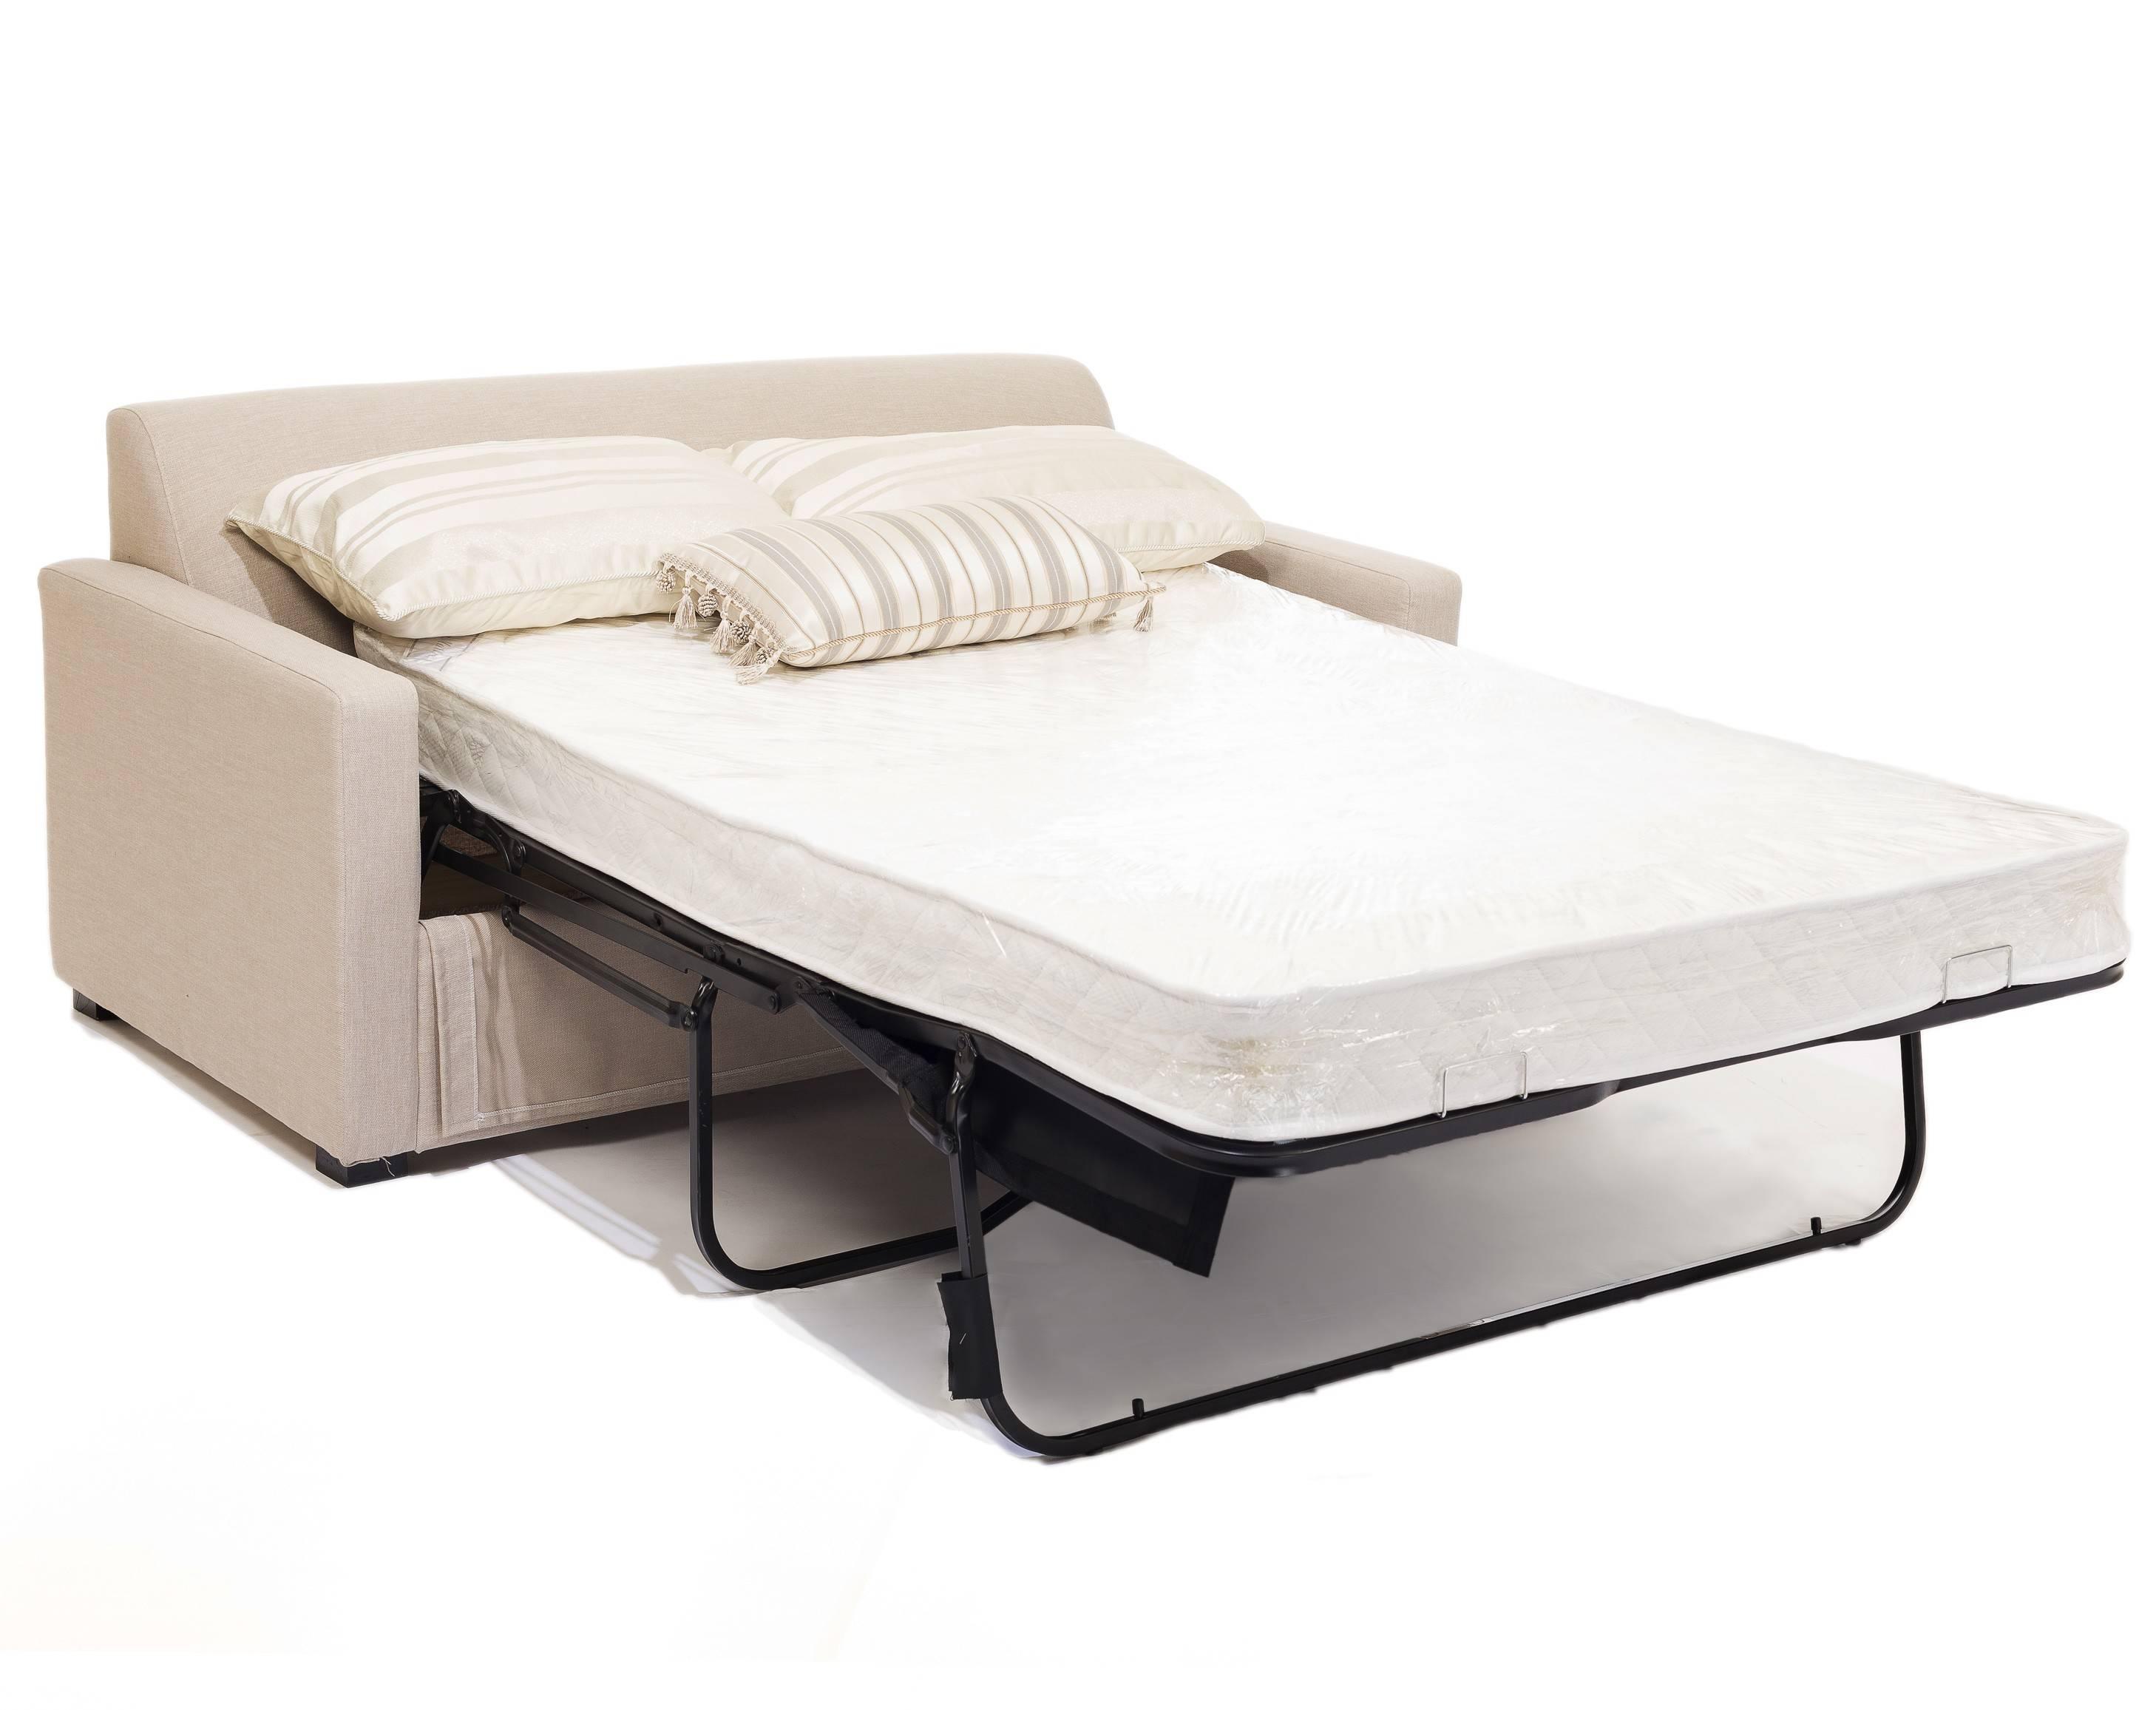 Sofas: Lazyboy Sofa Sleeper | La Z Boy Sleeper Loveseat | Lazy Boy In Sofas Mattress (View 14 of 15)